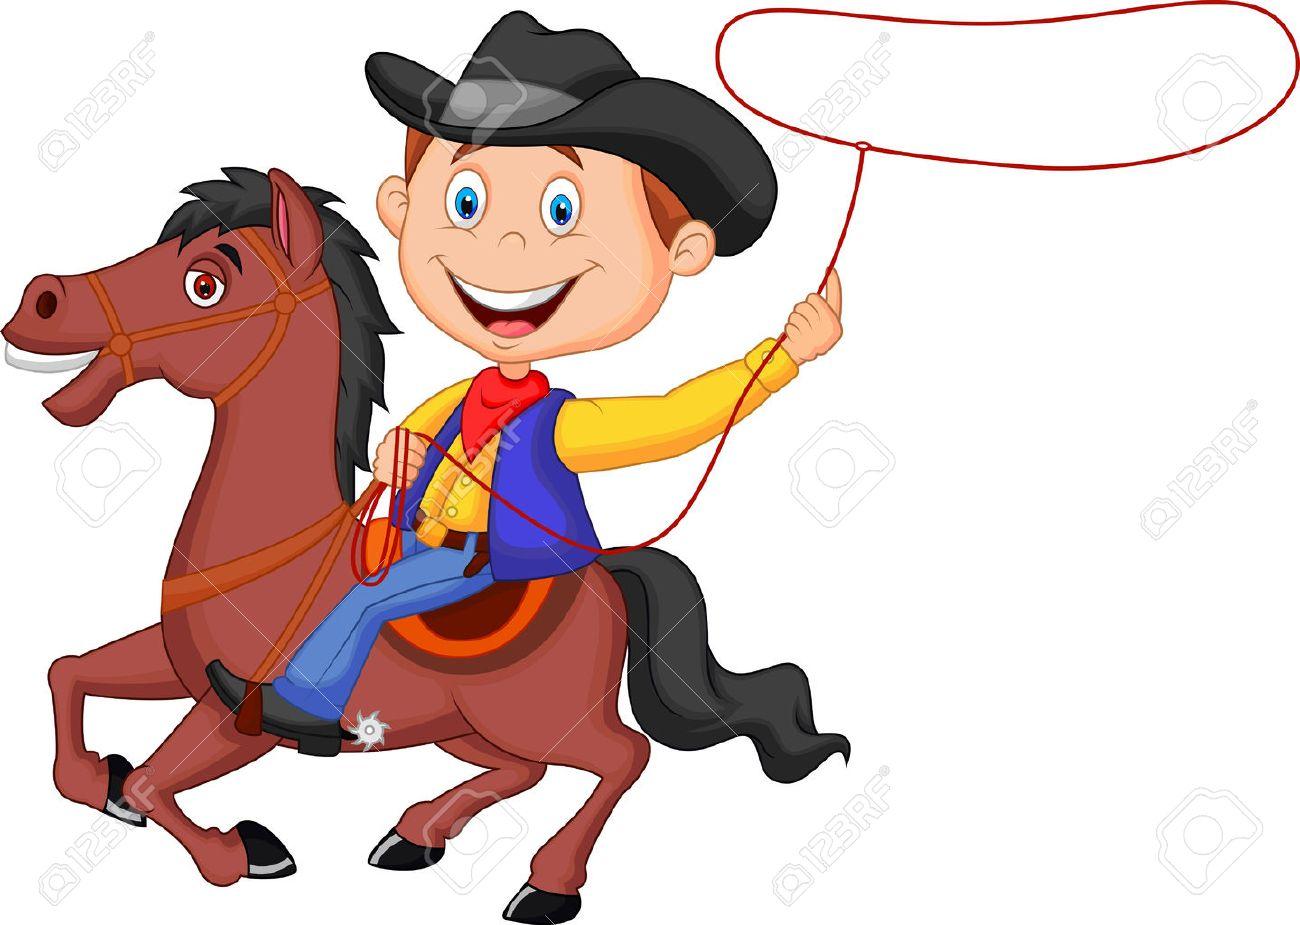 Image result for cowboy cartoon